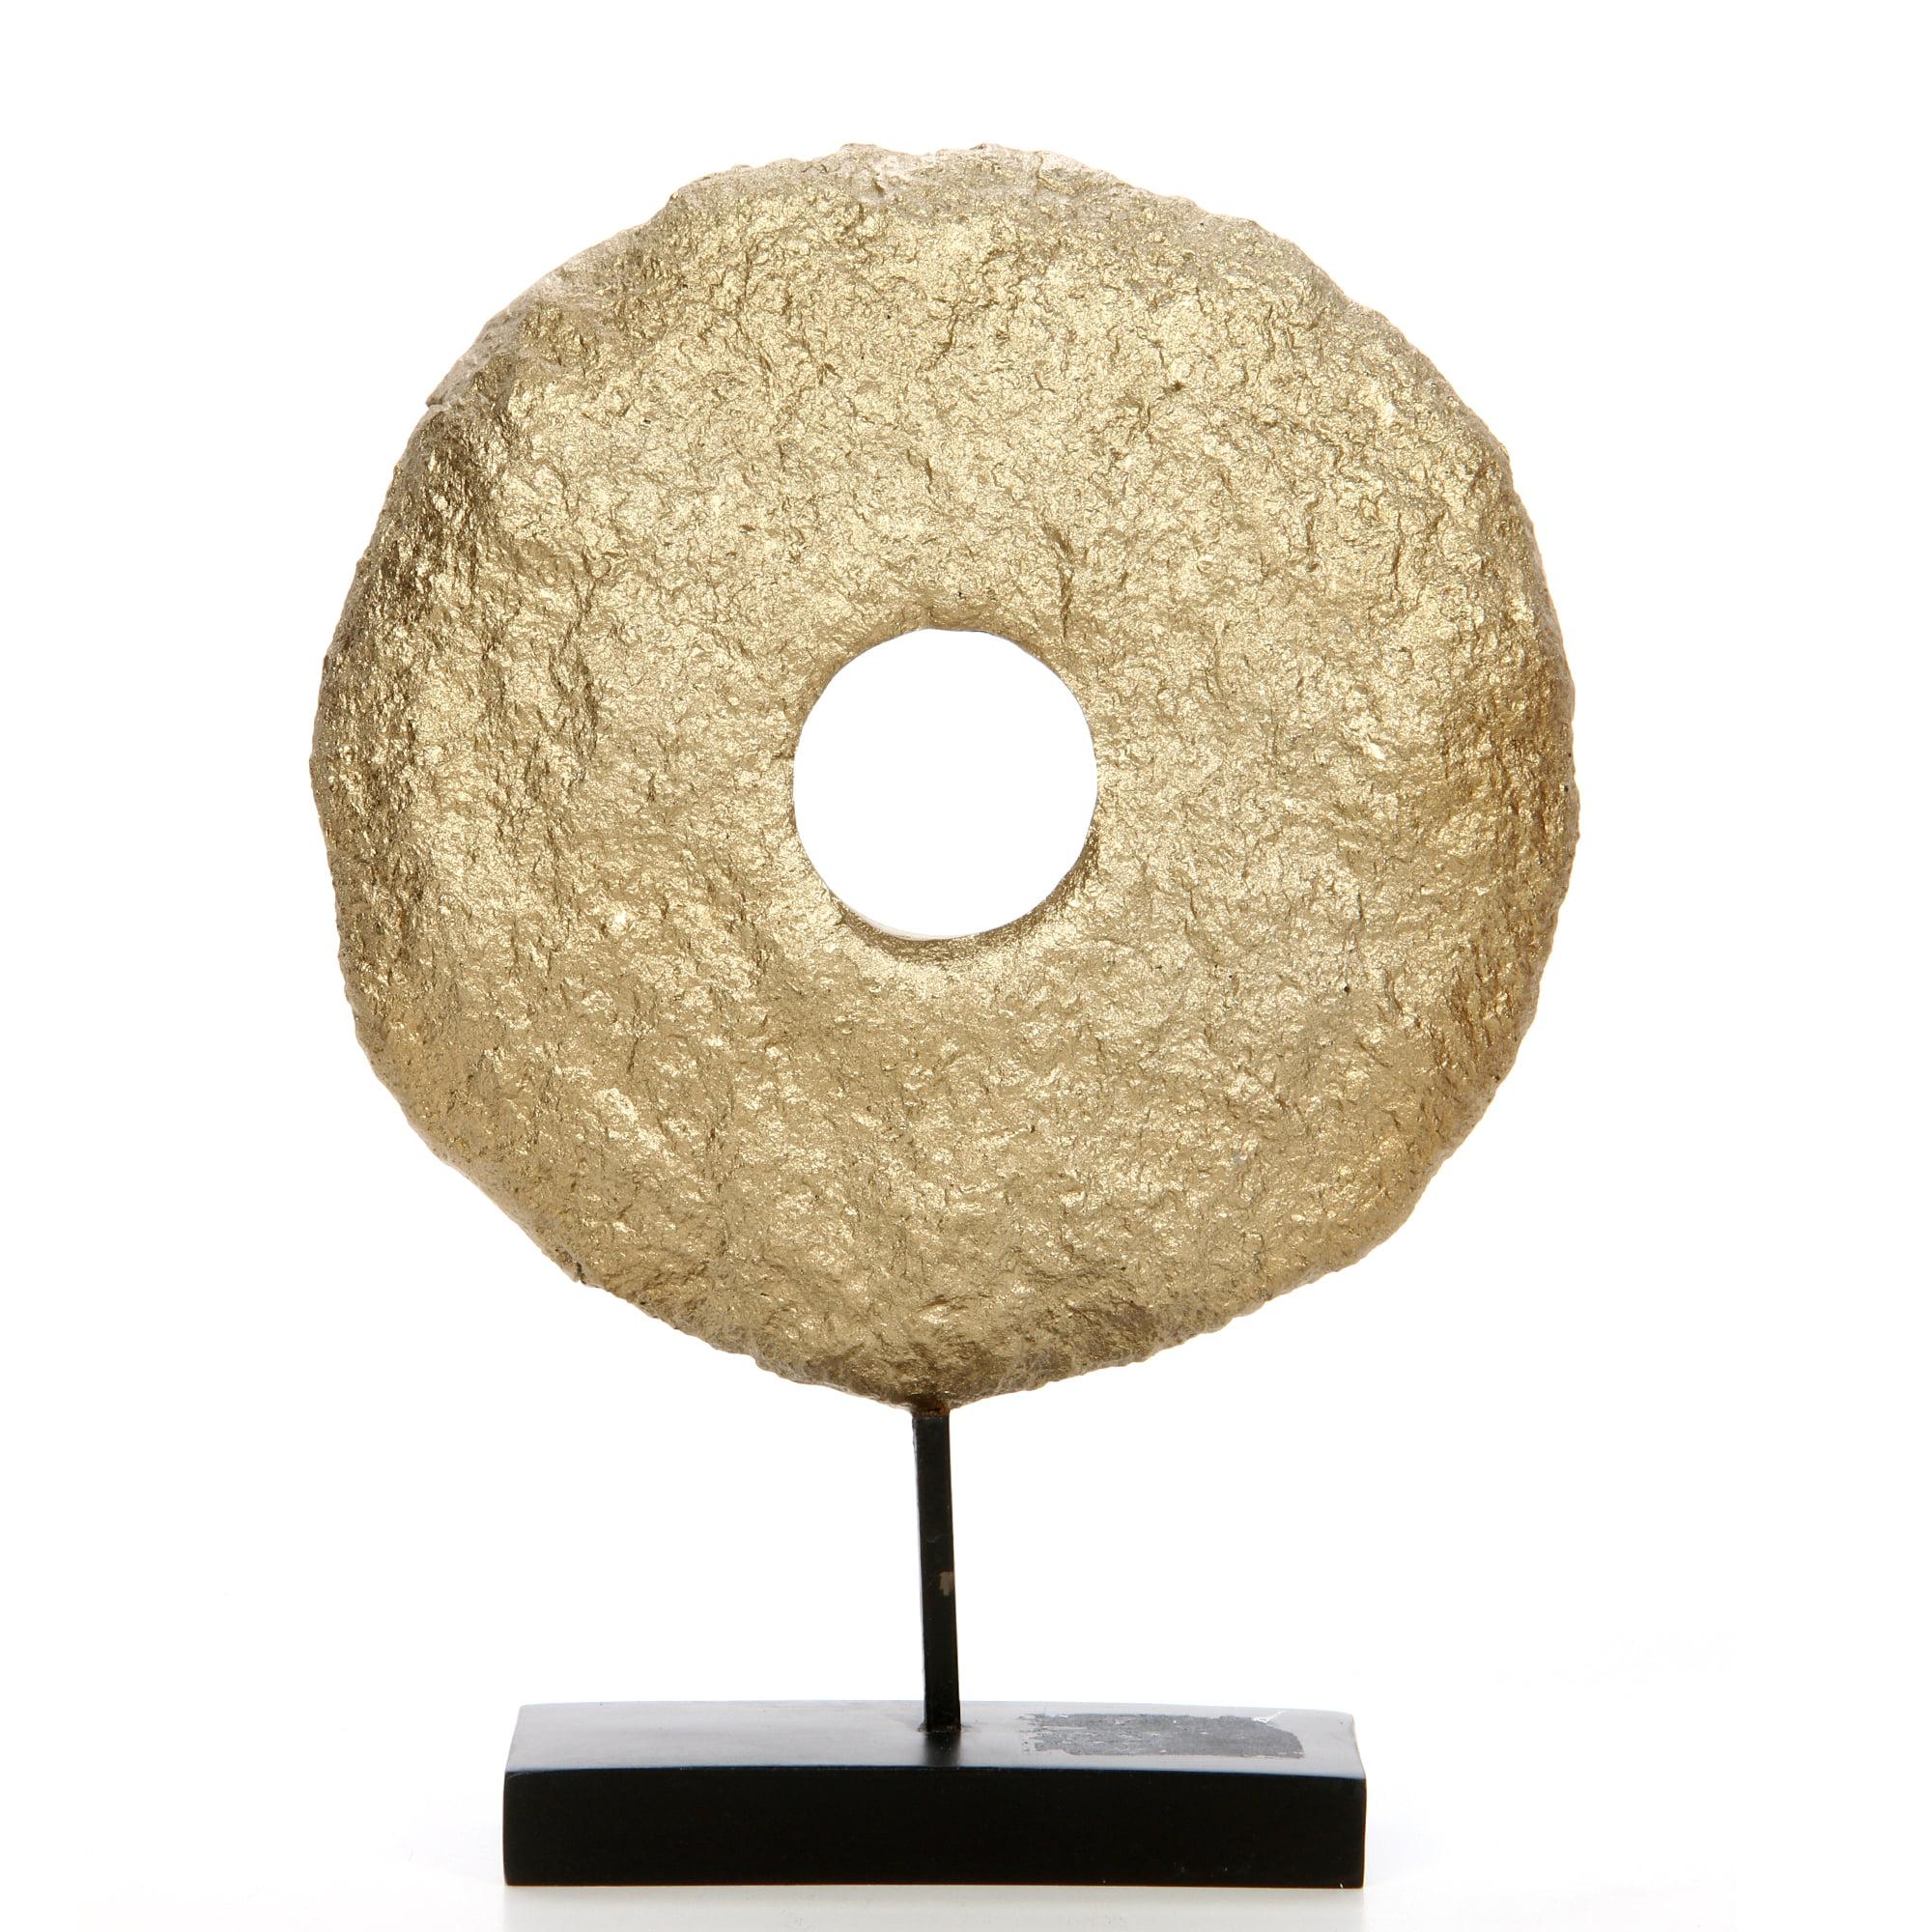 Decorative Tabletop Sculpture Gold Pedestal